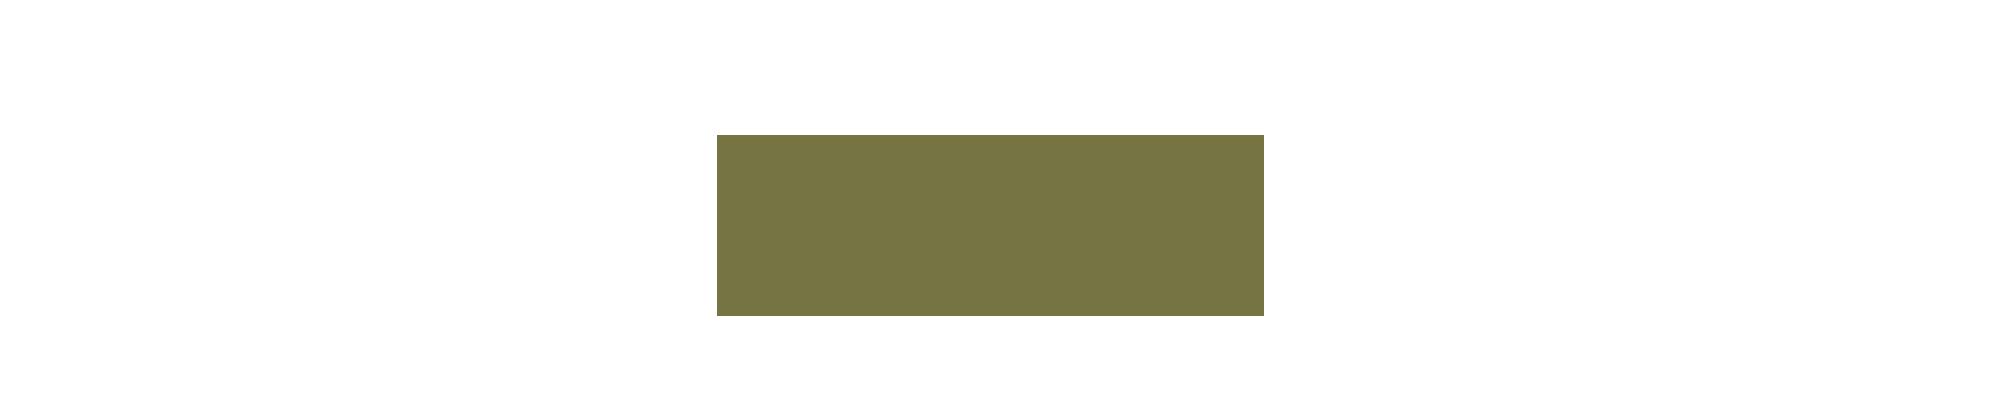 harold-stephens-glasses-green.png